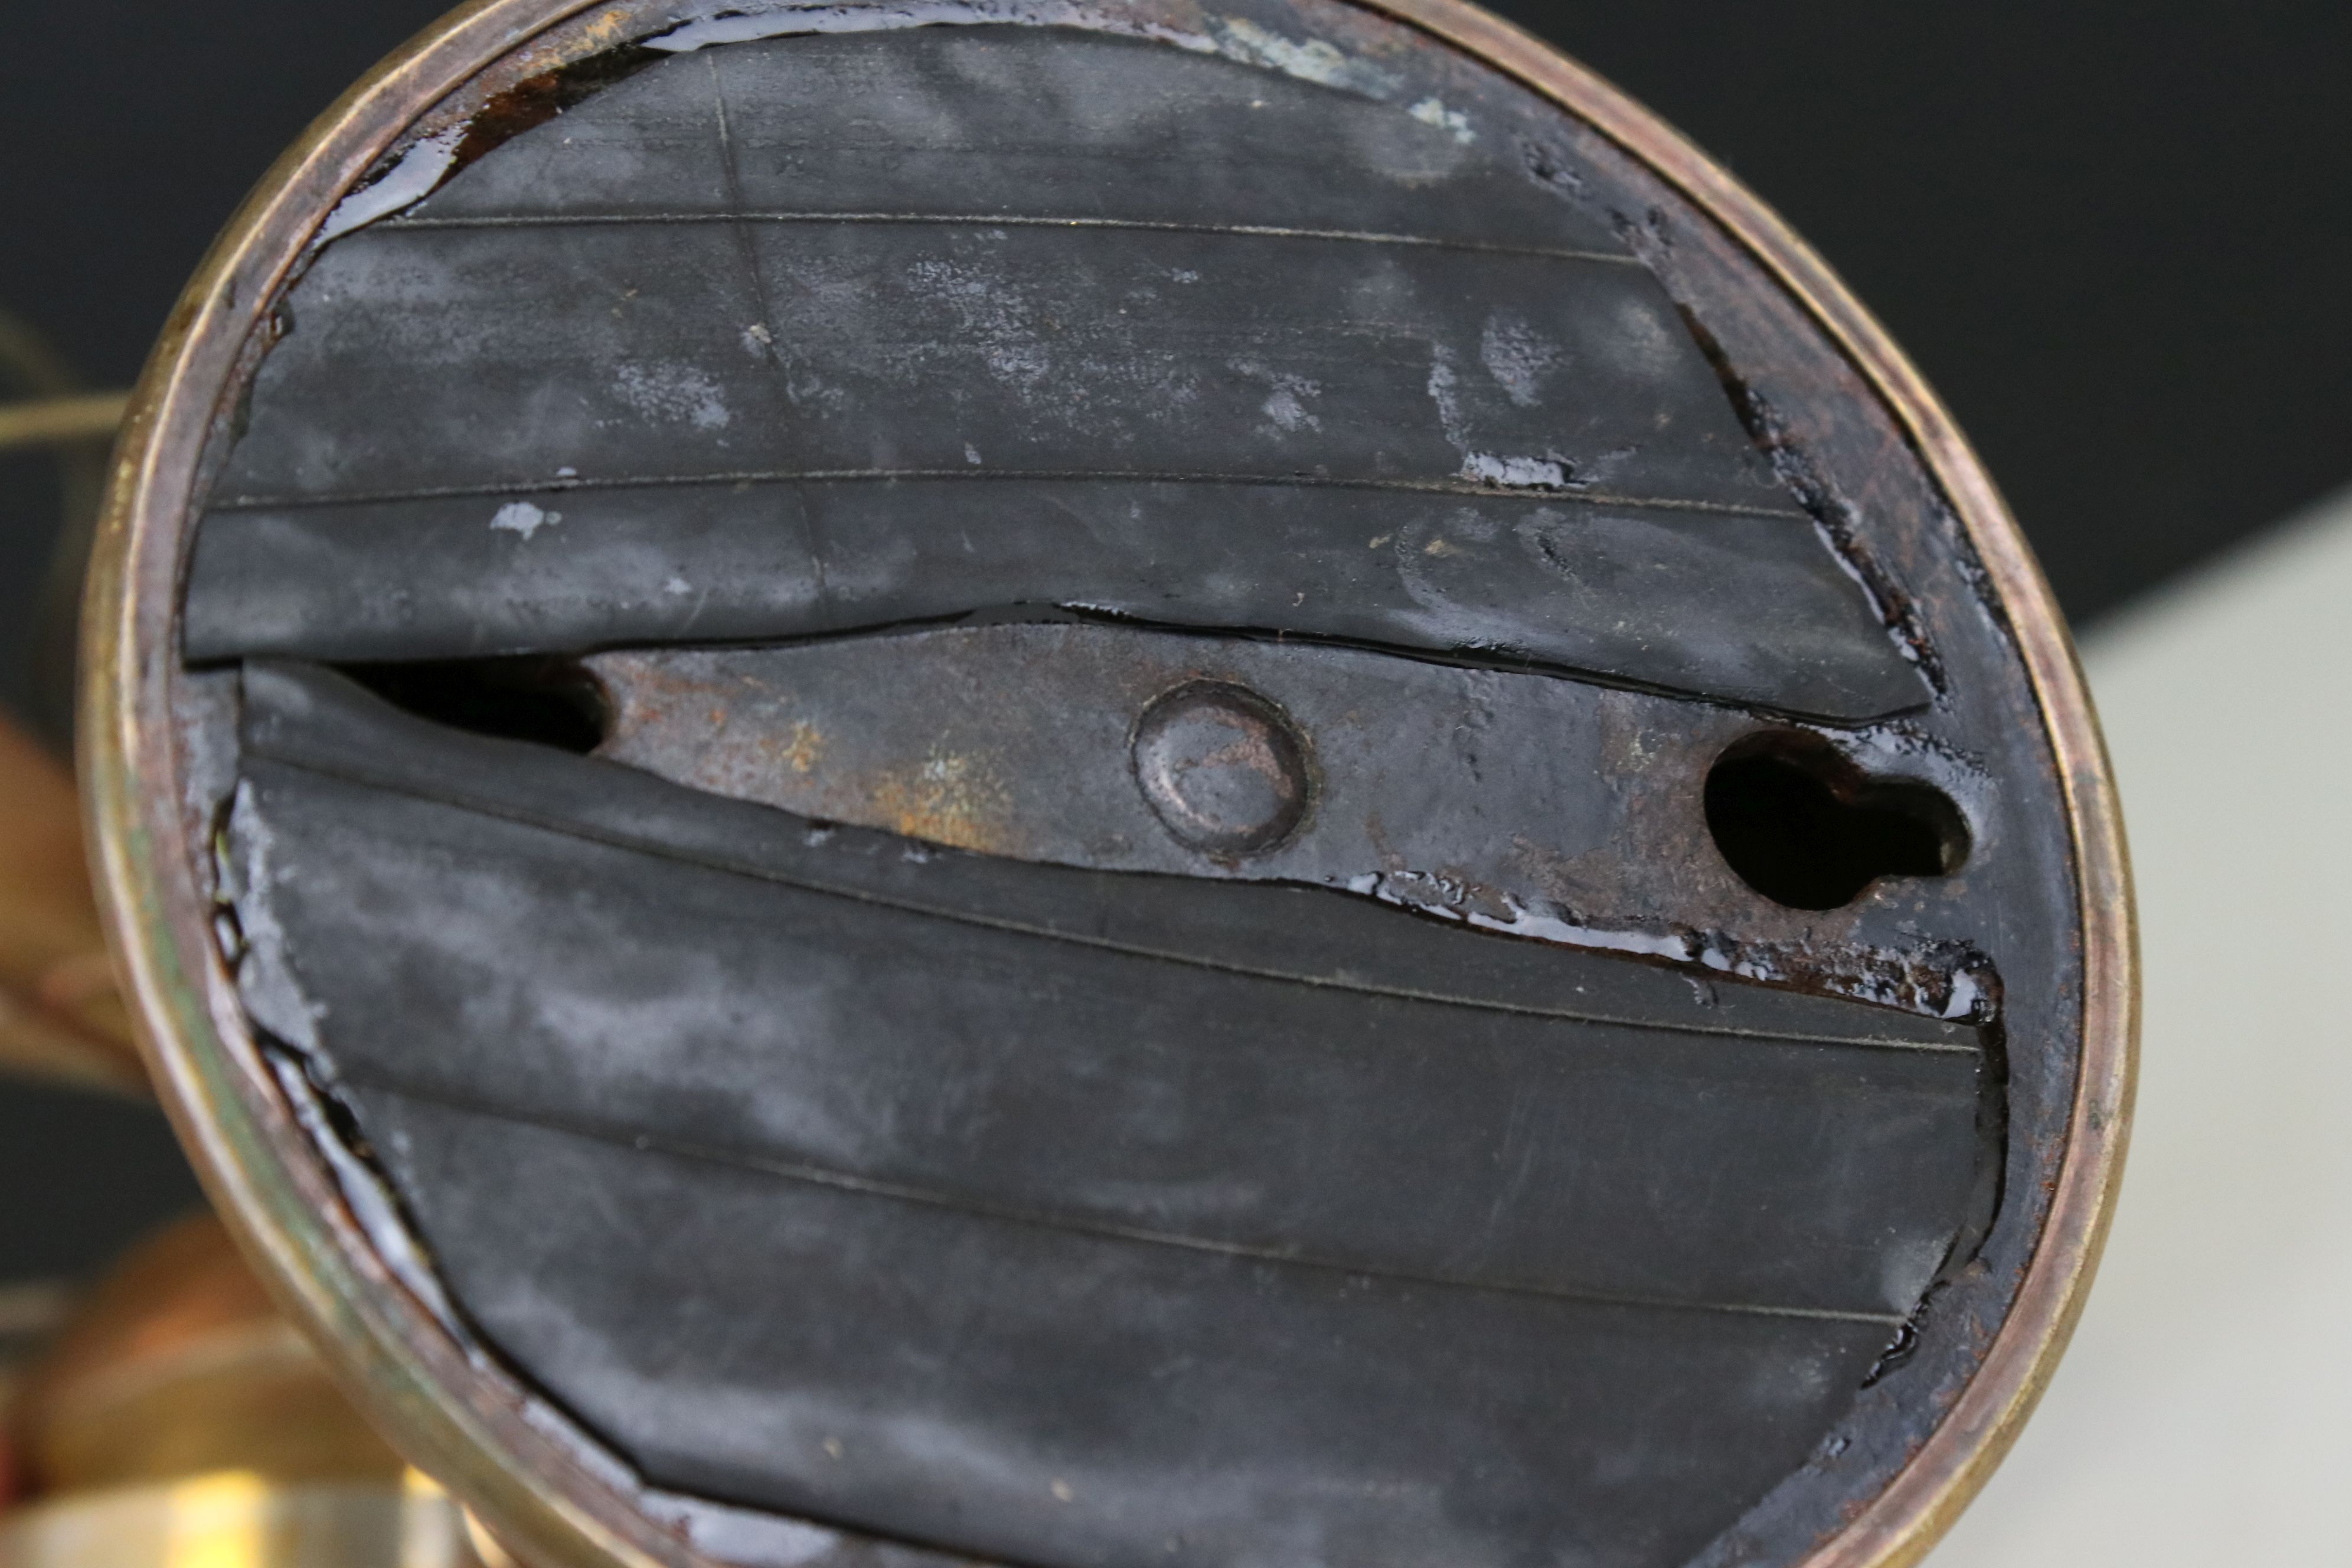 Early 20th century Brass Desk Fan, 32cms high - Image 5 of 5